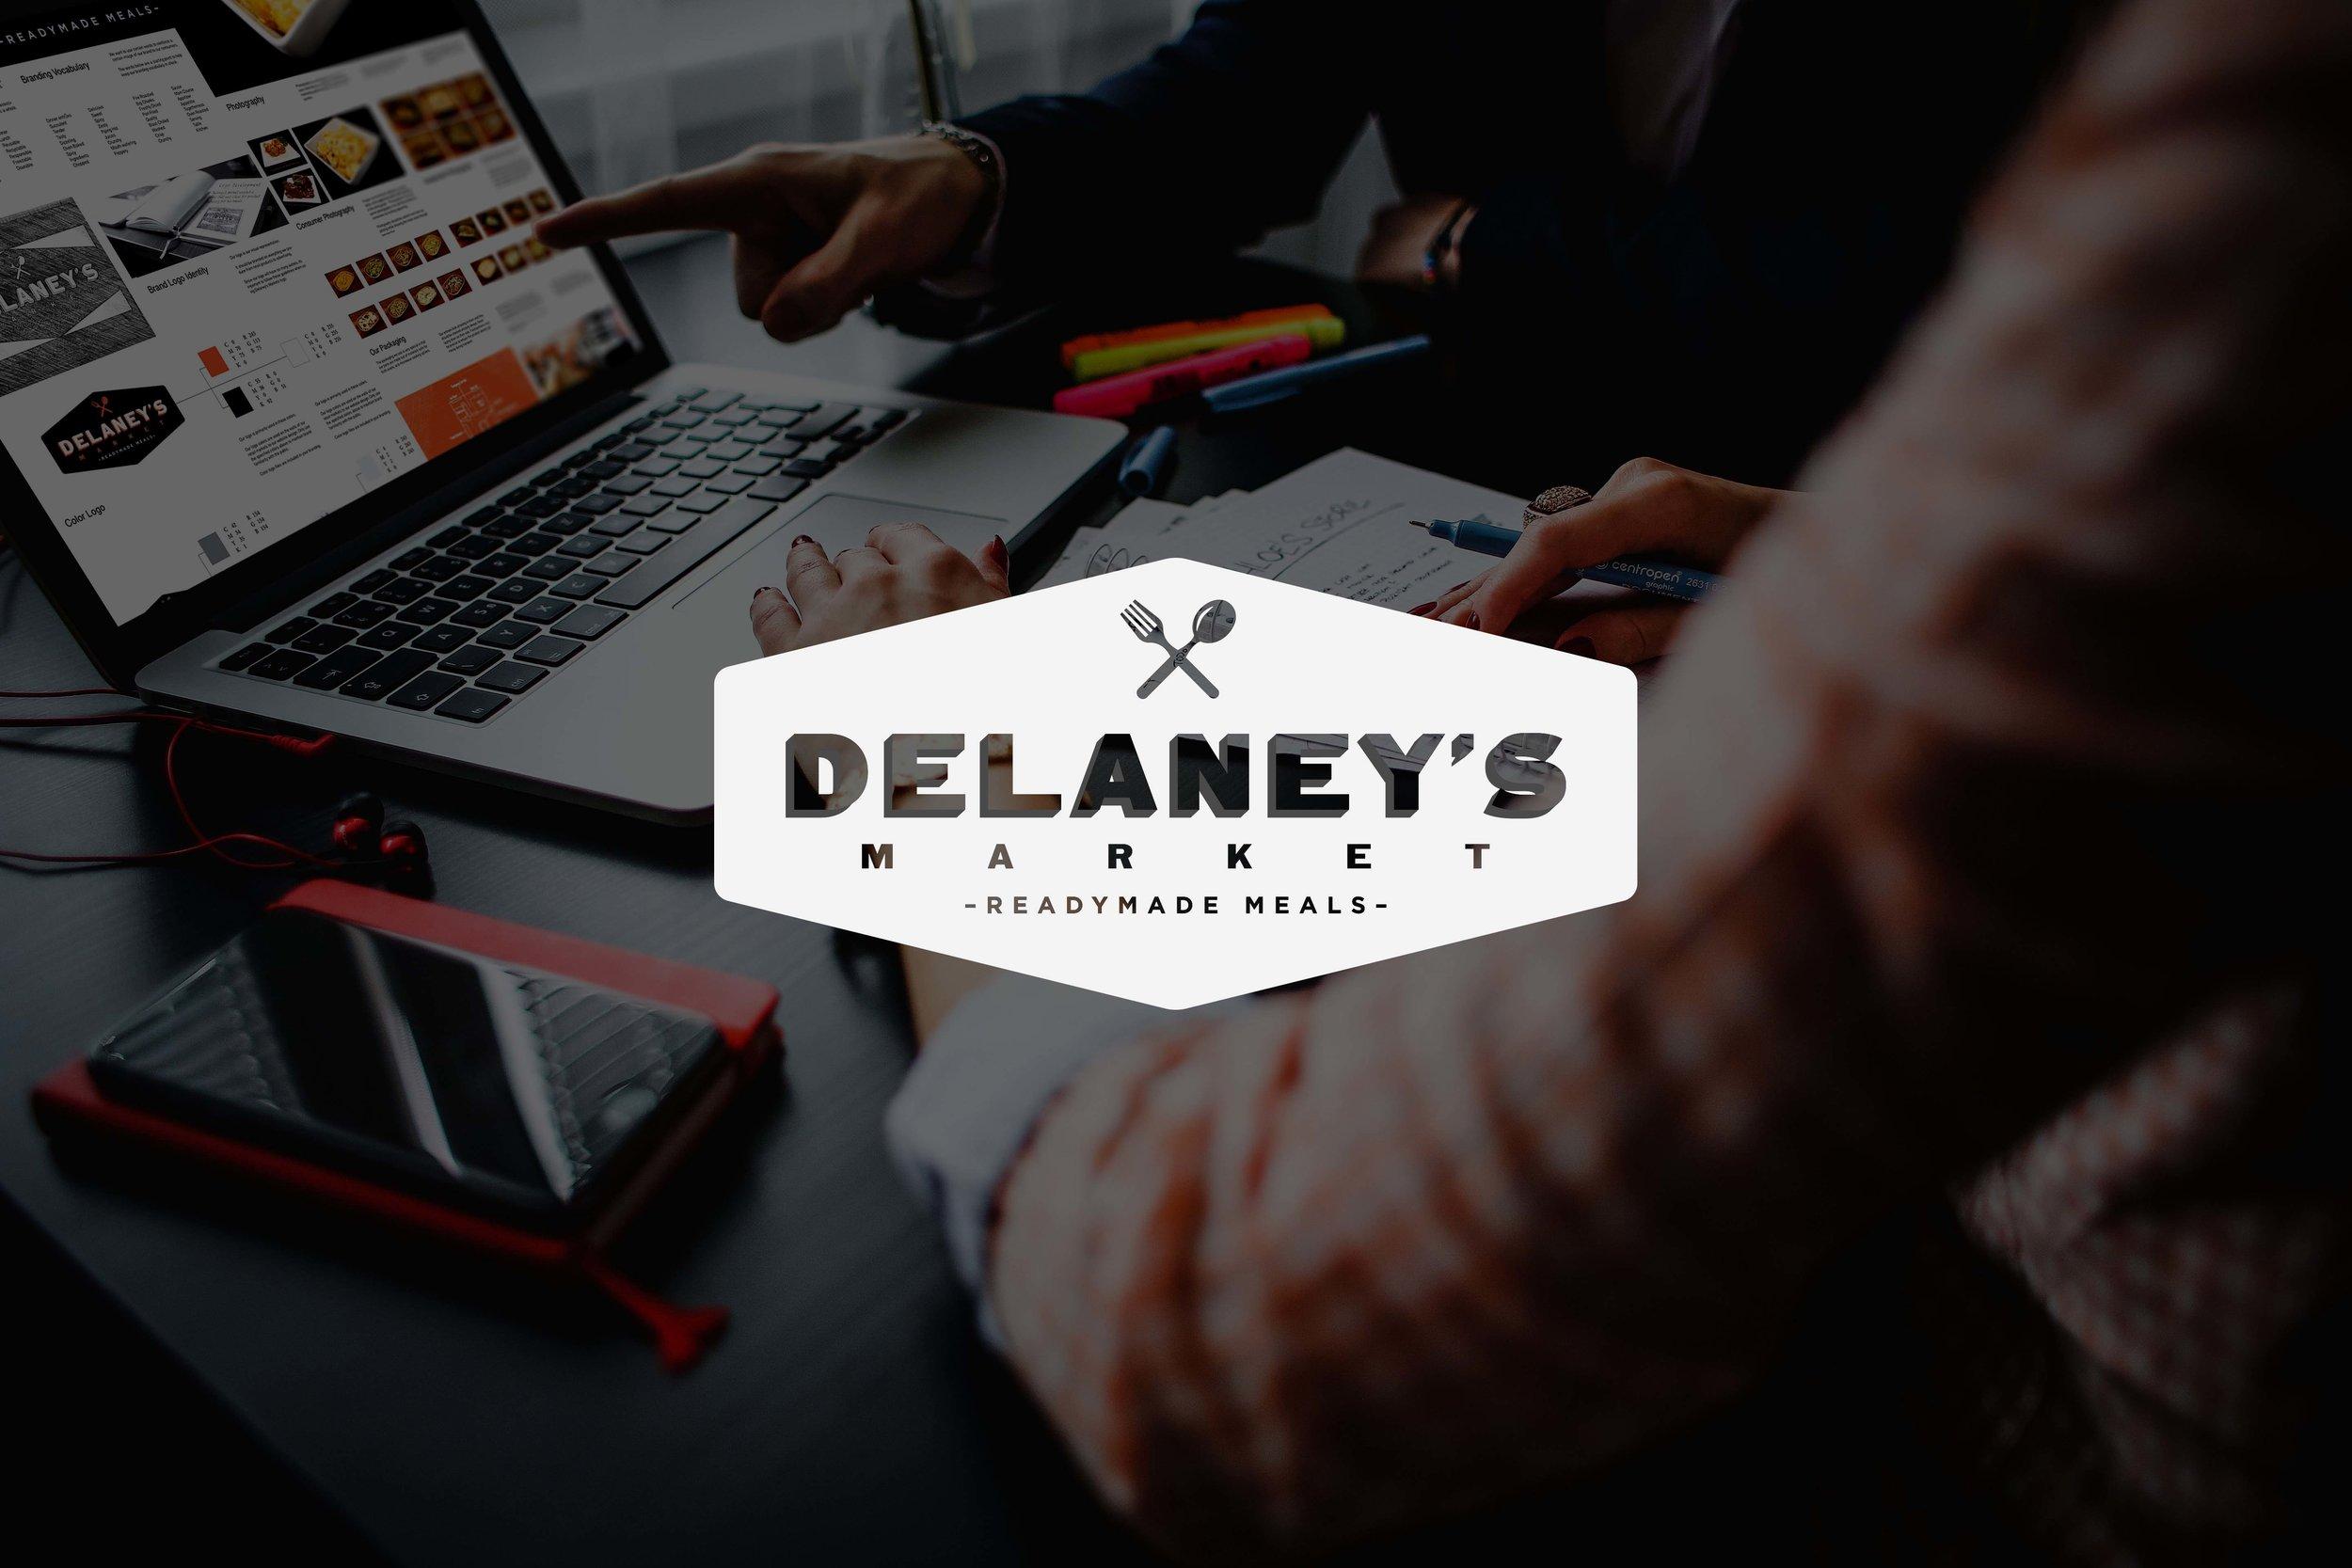 Delaney's Market: Food&Bev Retailer / MA - USA Retail Branding /Photo & Video Production / Design